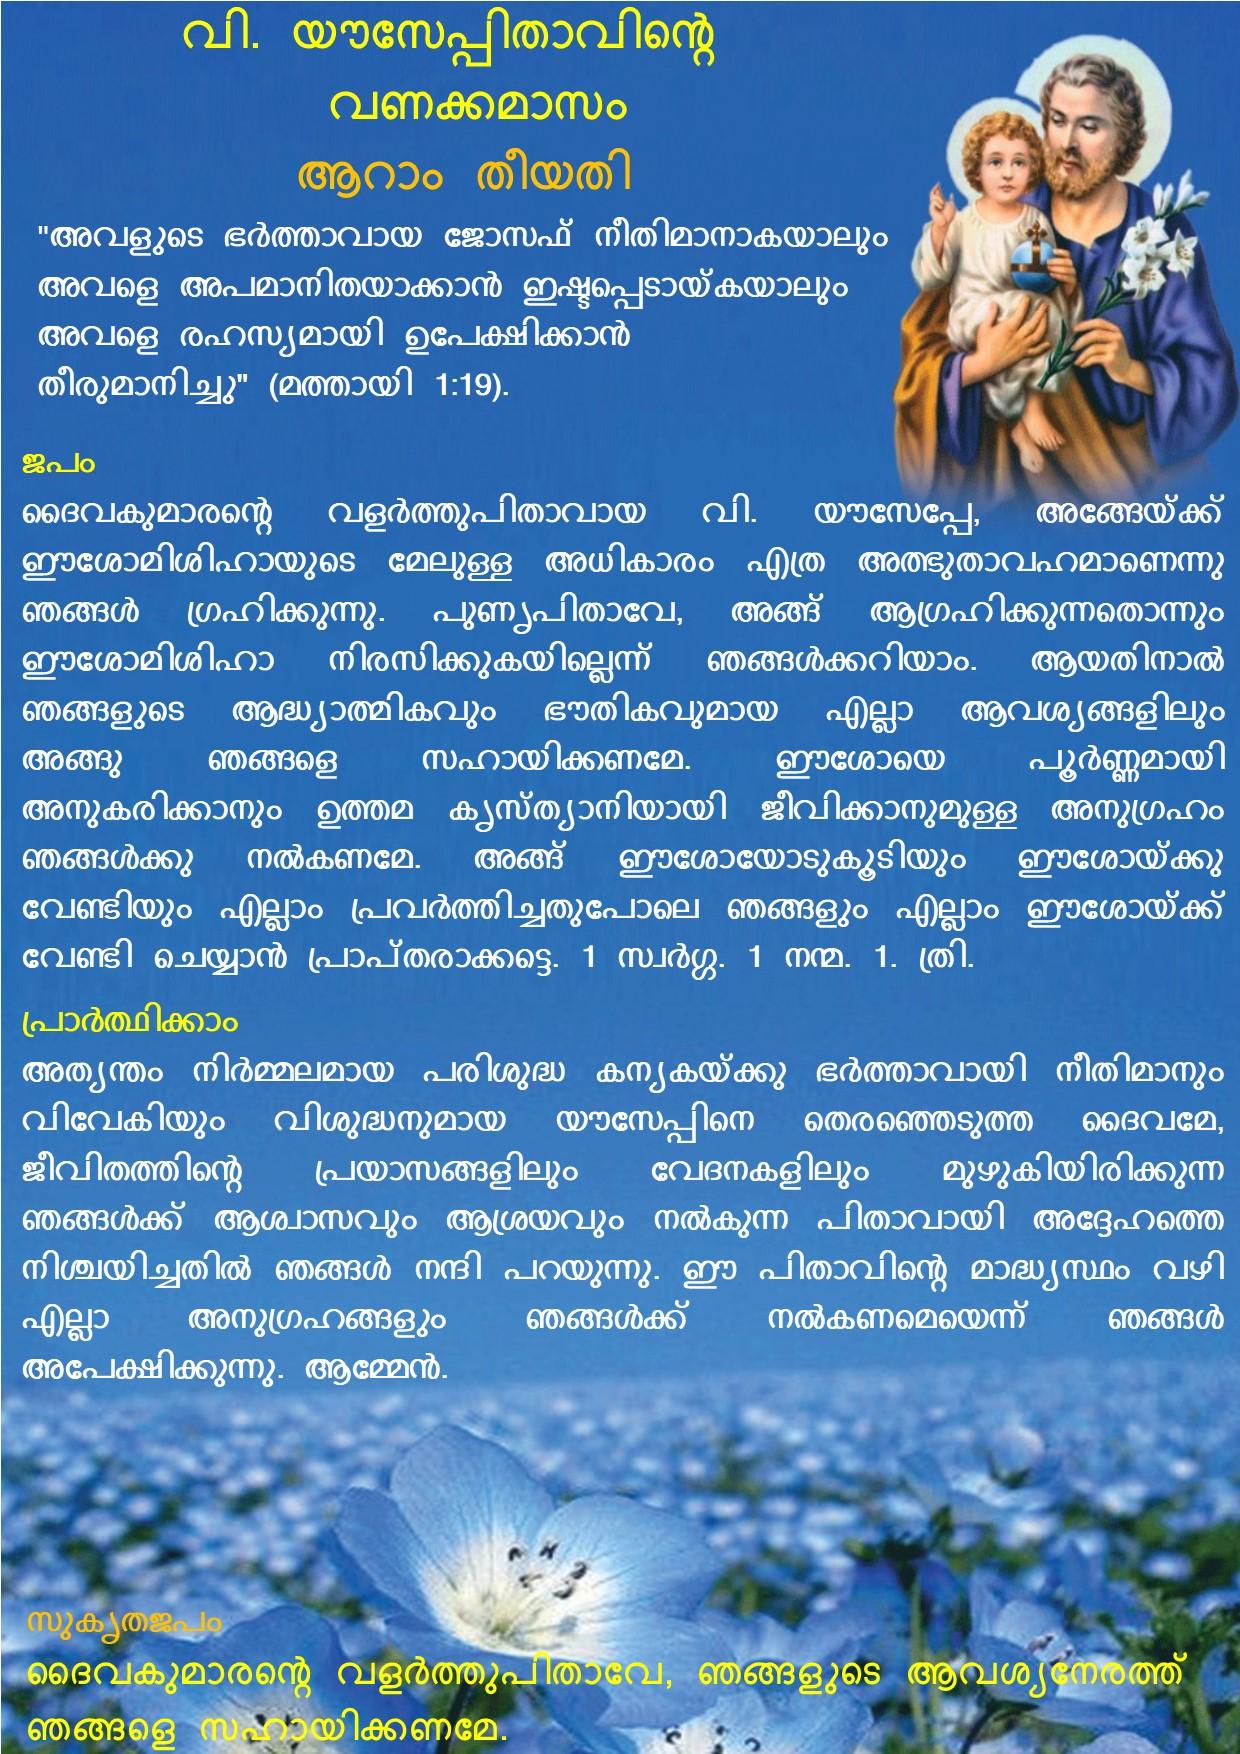 Vanakkamasam, St Joseph, March 06